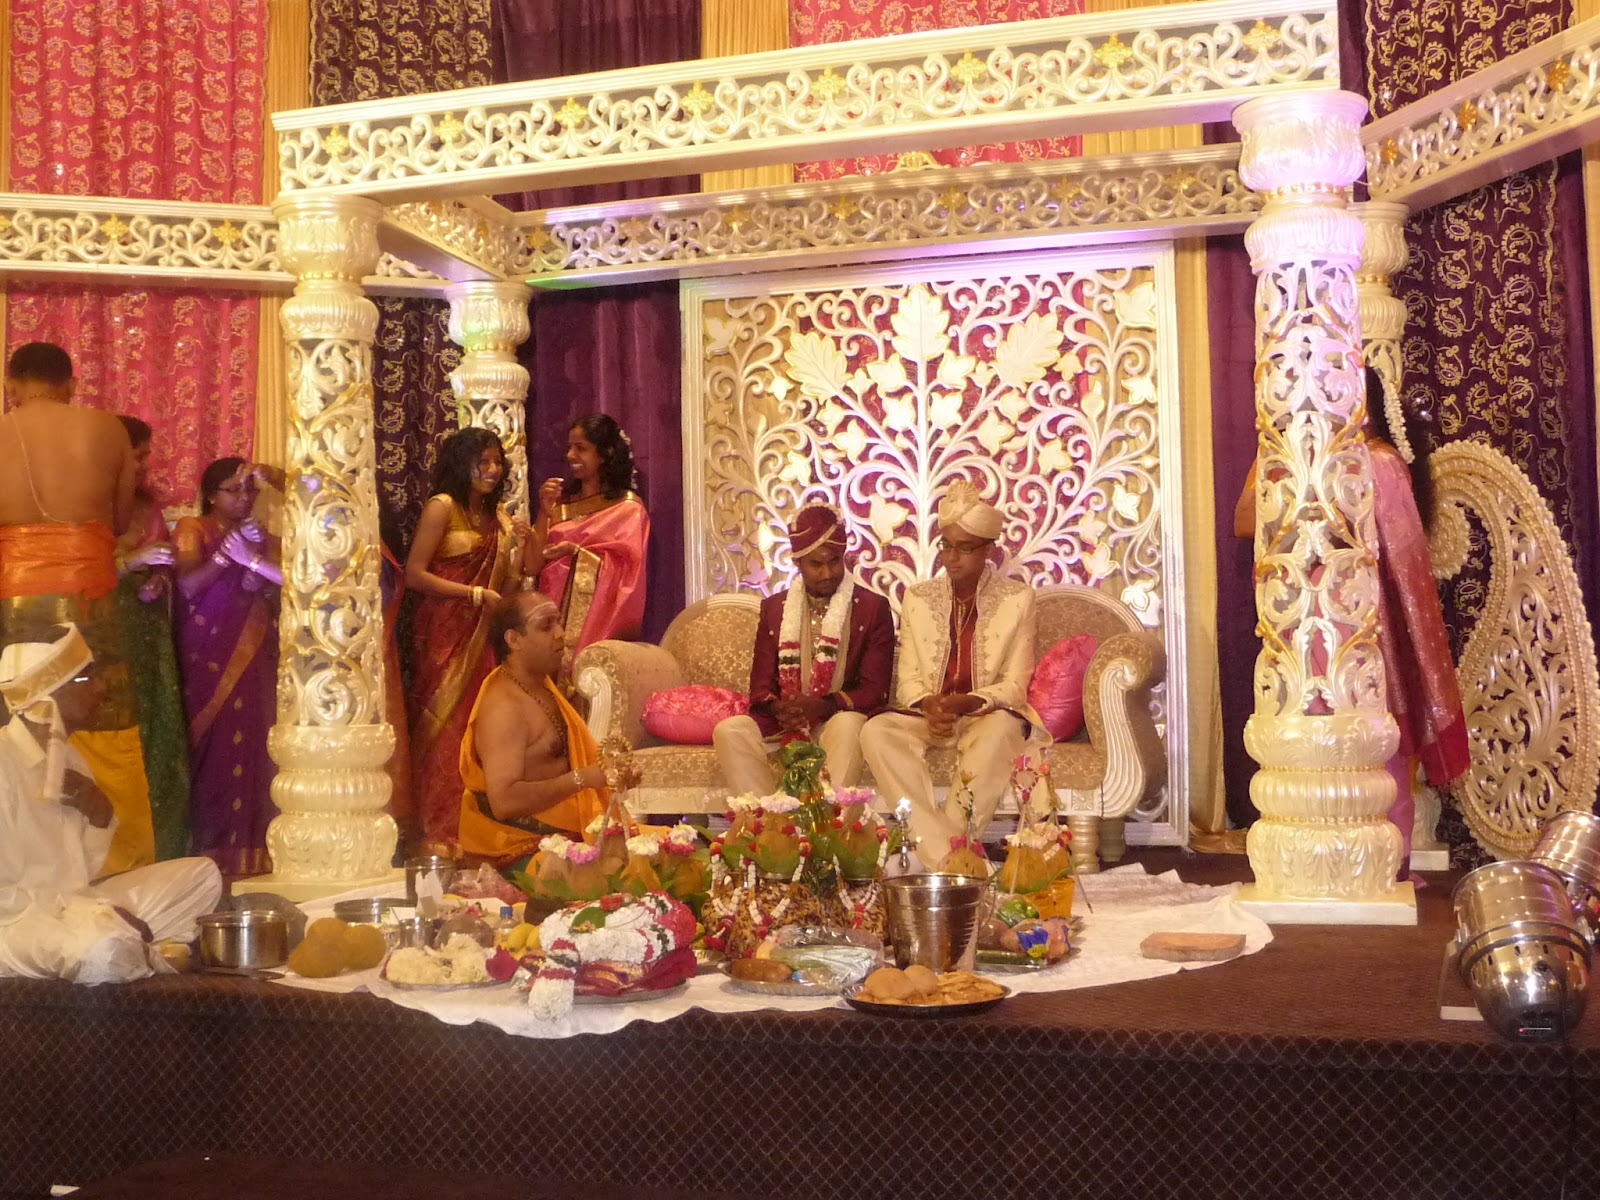 Hindu Wedding Invitations Toronto: Adventures In PEI And Beyond!: A Hindu Canadian Wedding